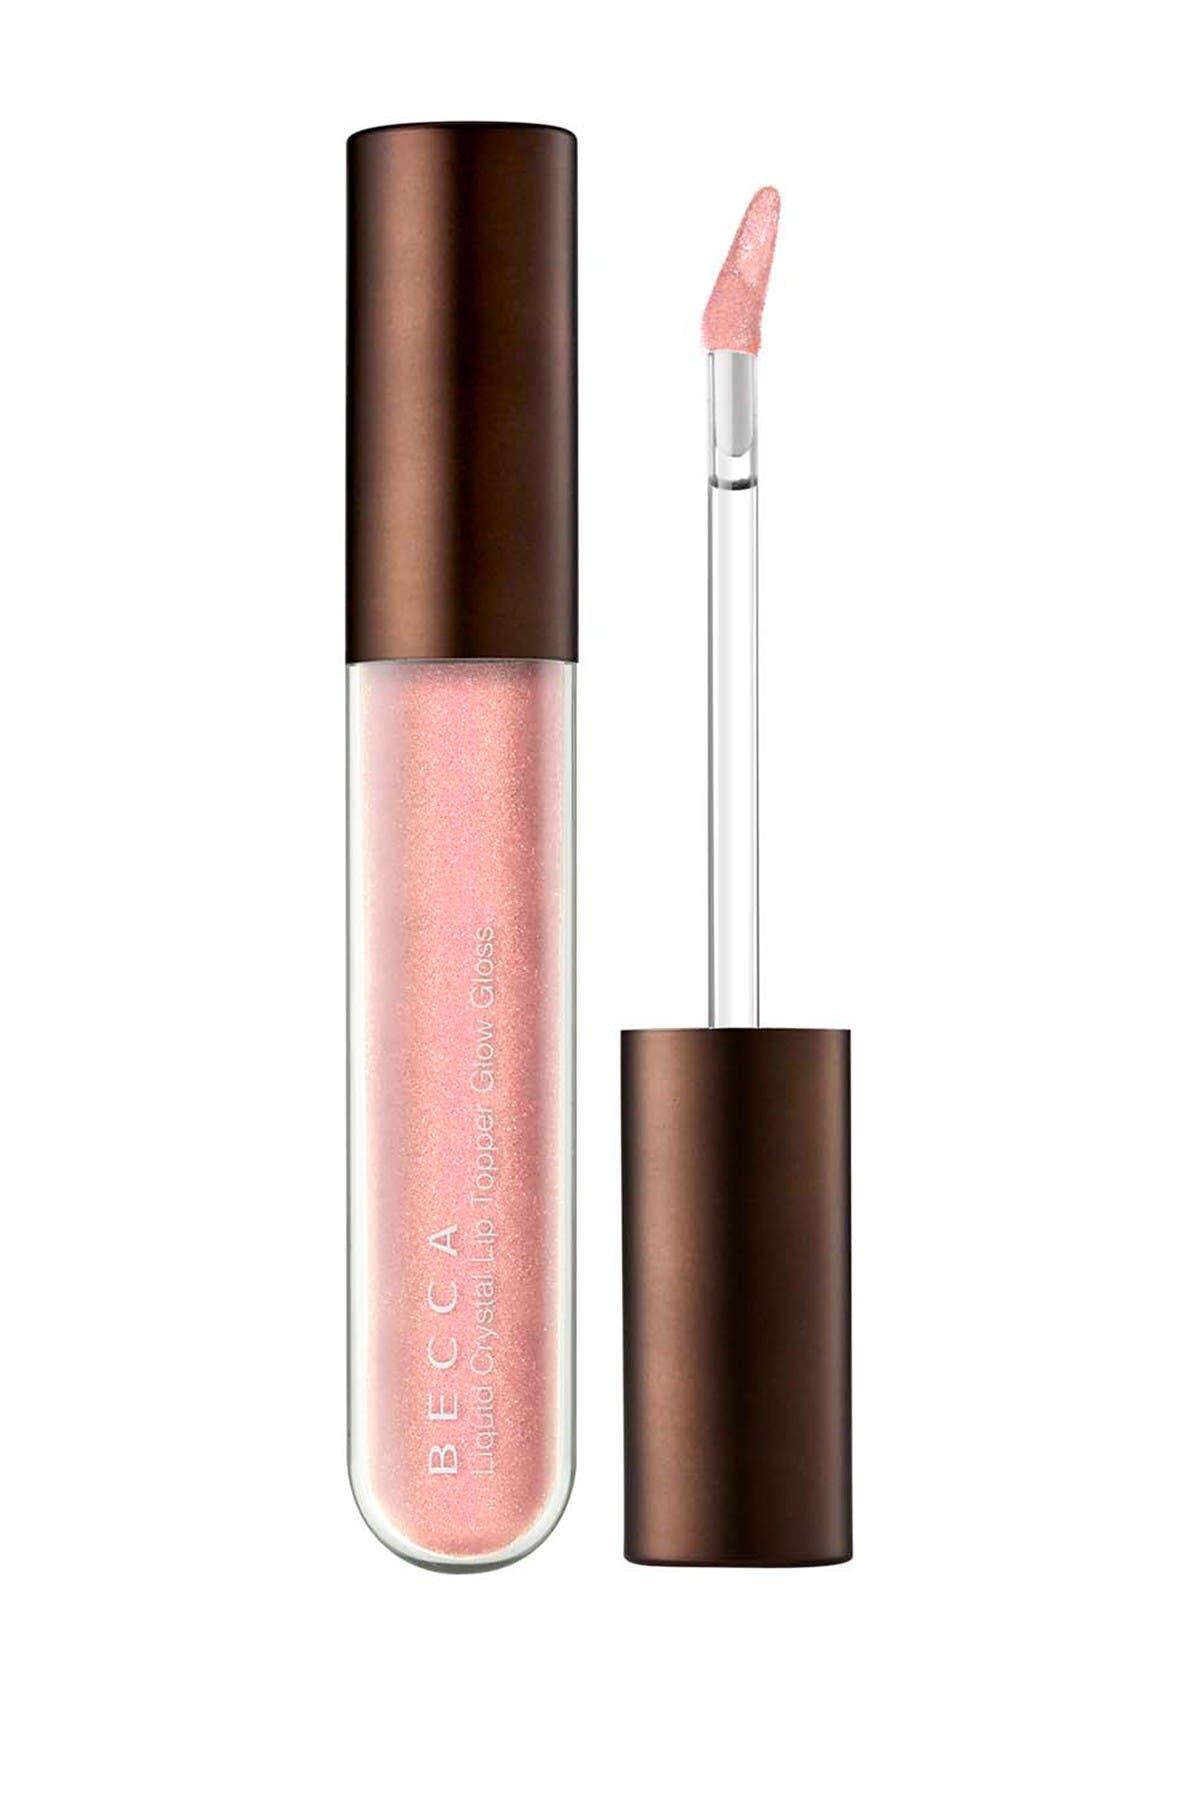 Image of BECCA Cosmetics Liquid Crystal Lip Topper Rose Quartz x Seashell